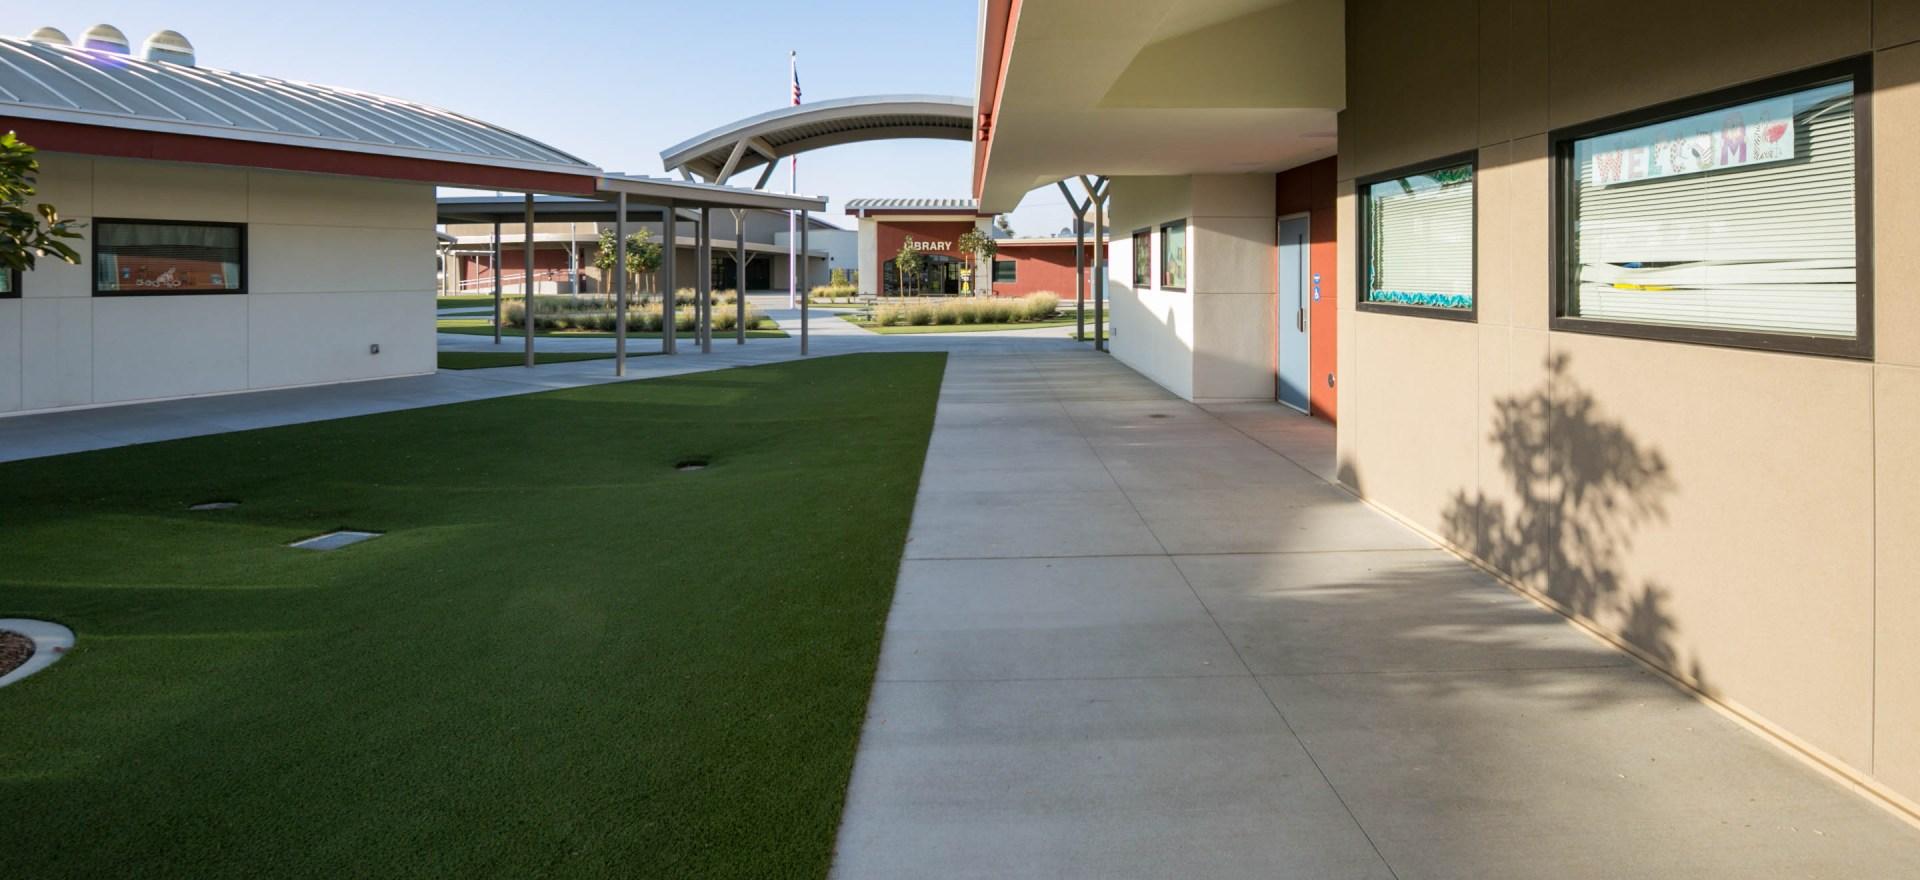 JTSModular-WhitleyElementarySchool-RobRijnenPhotography (25 of 36)